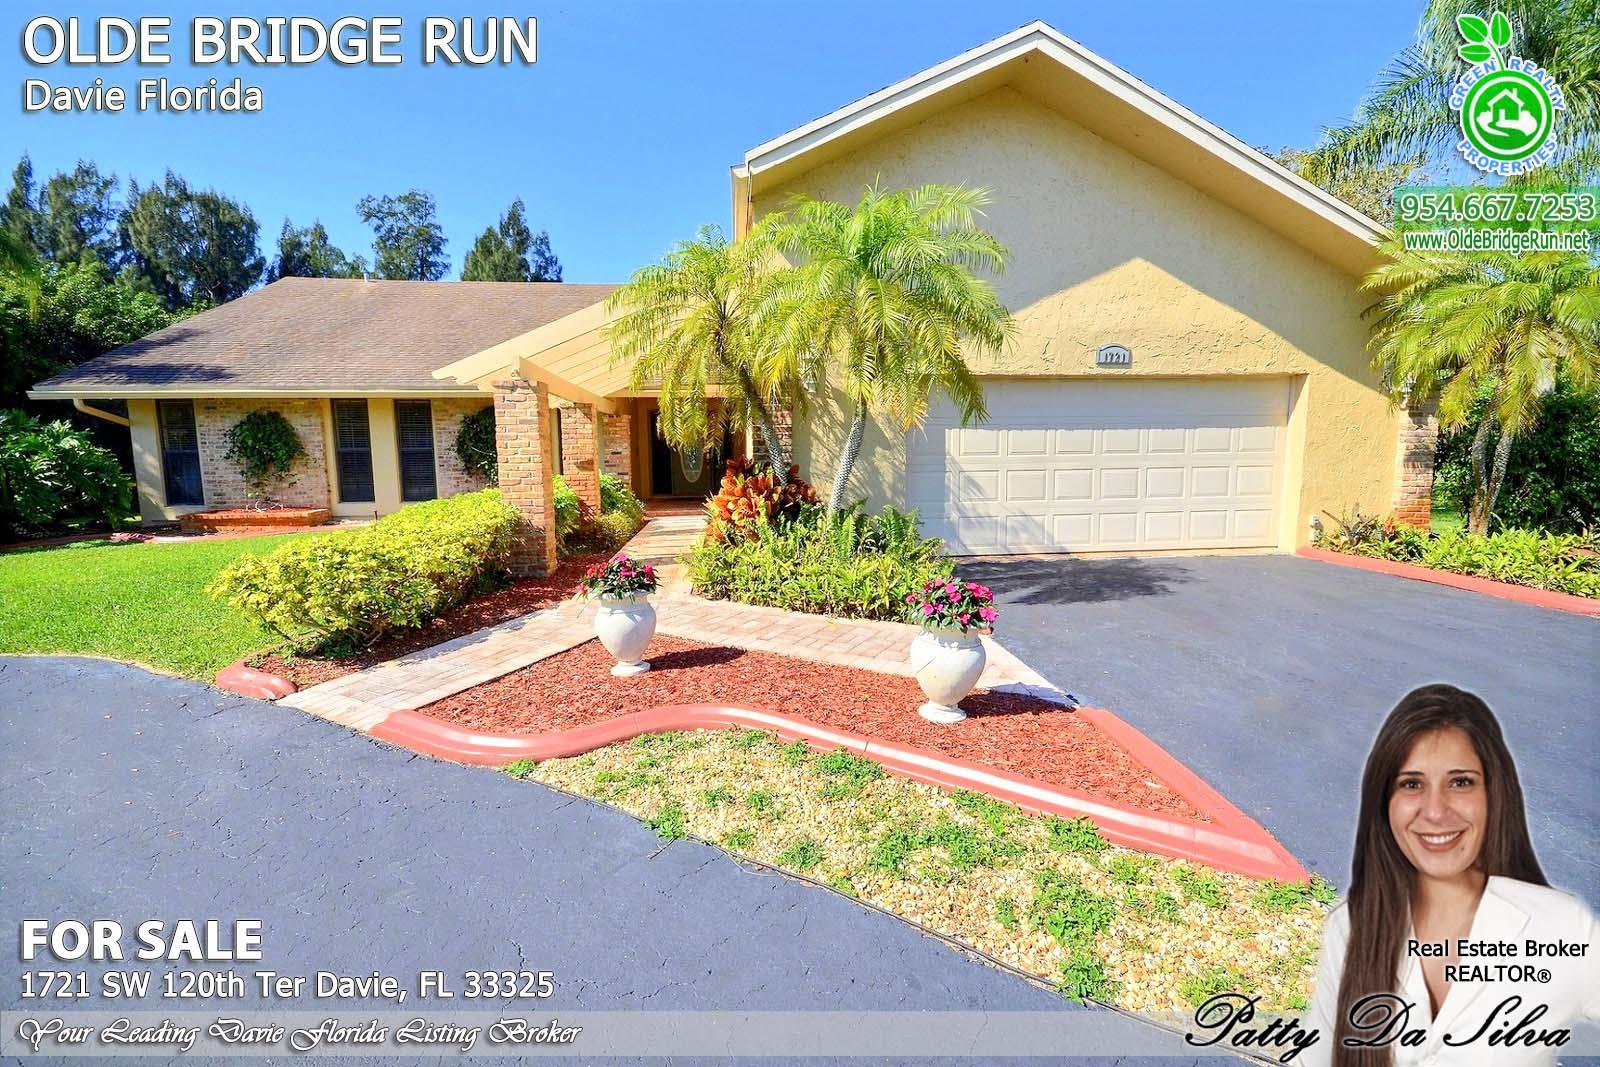 Olde Brodge Run Homes in Davie FL beautiful properties